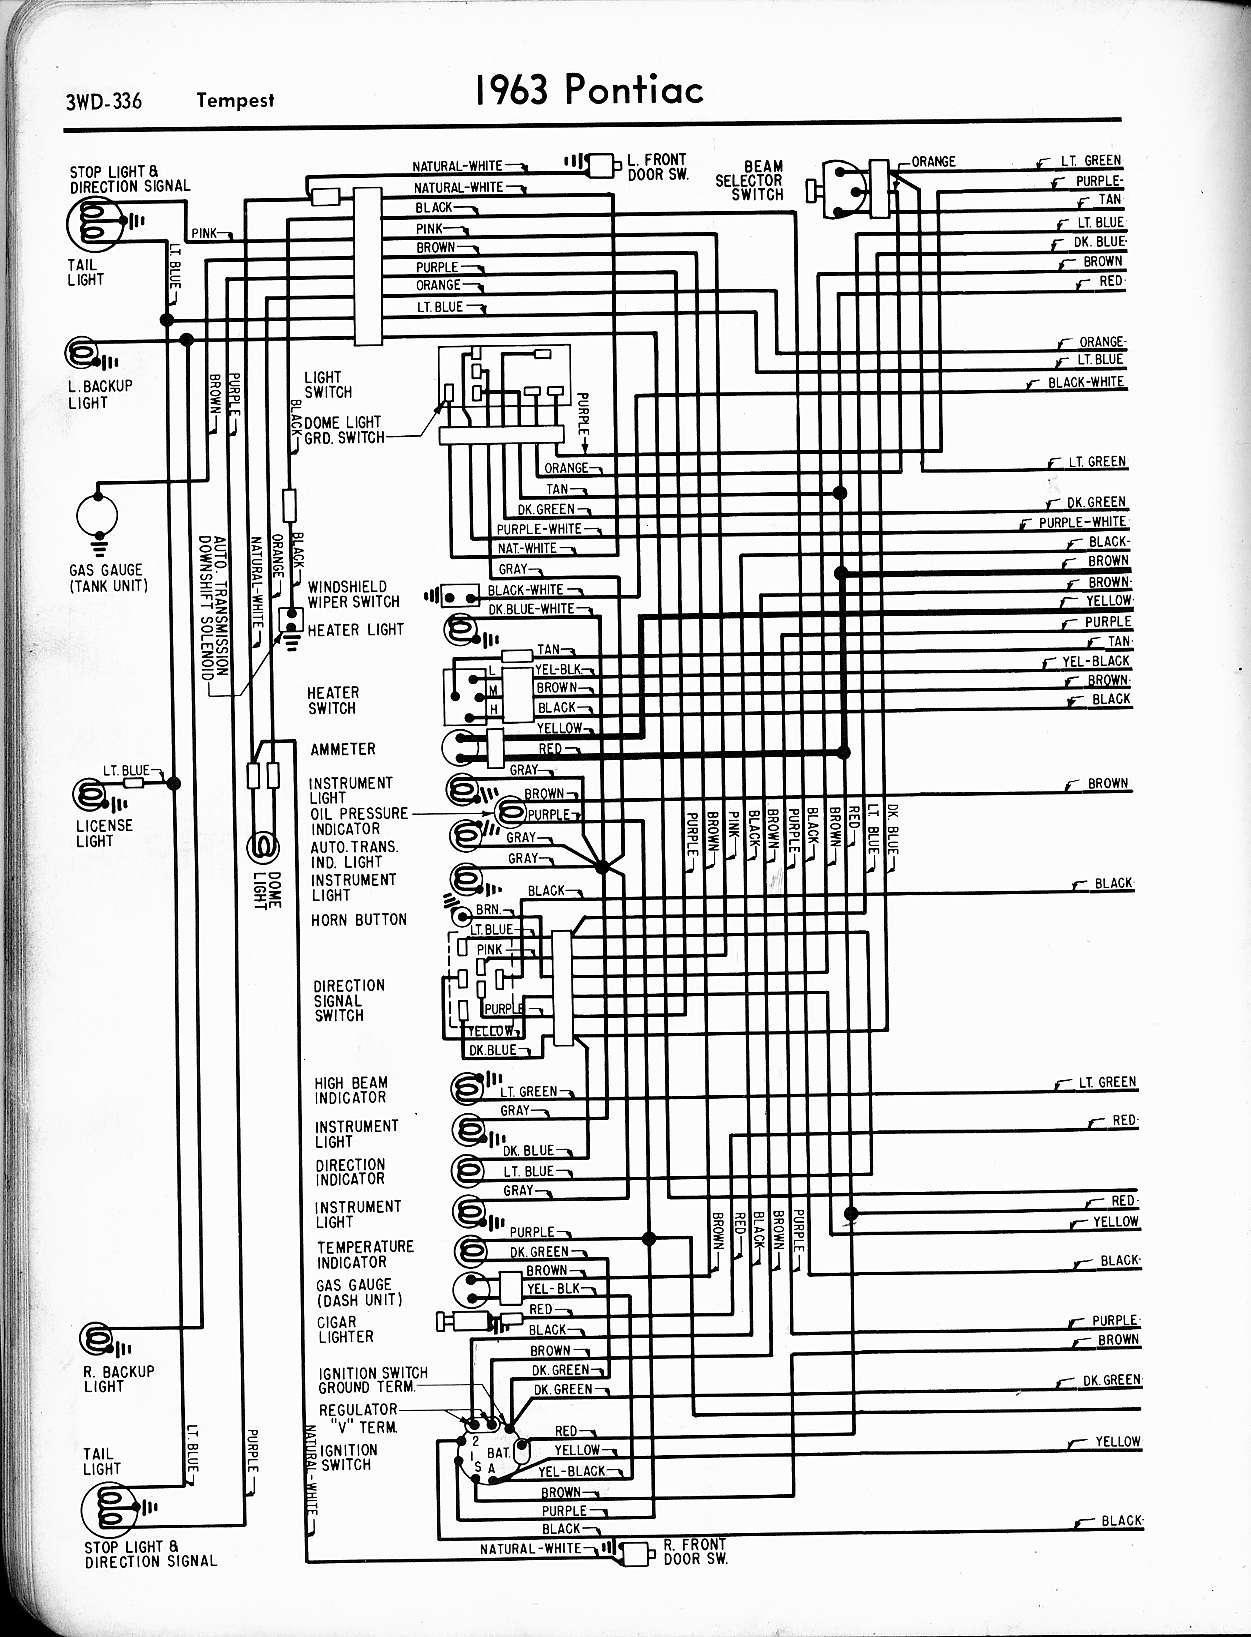 68 pontiac gto ignition wiring - 2000 jetta fuse box -  pump.los-dodol.jeanjaures37.fr  wiring diagram resource